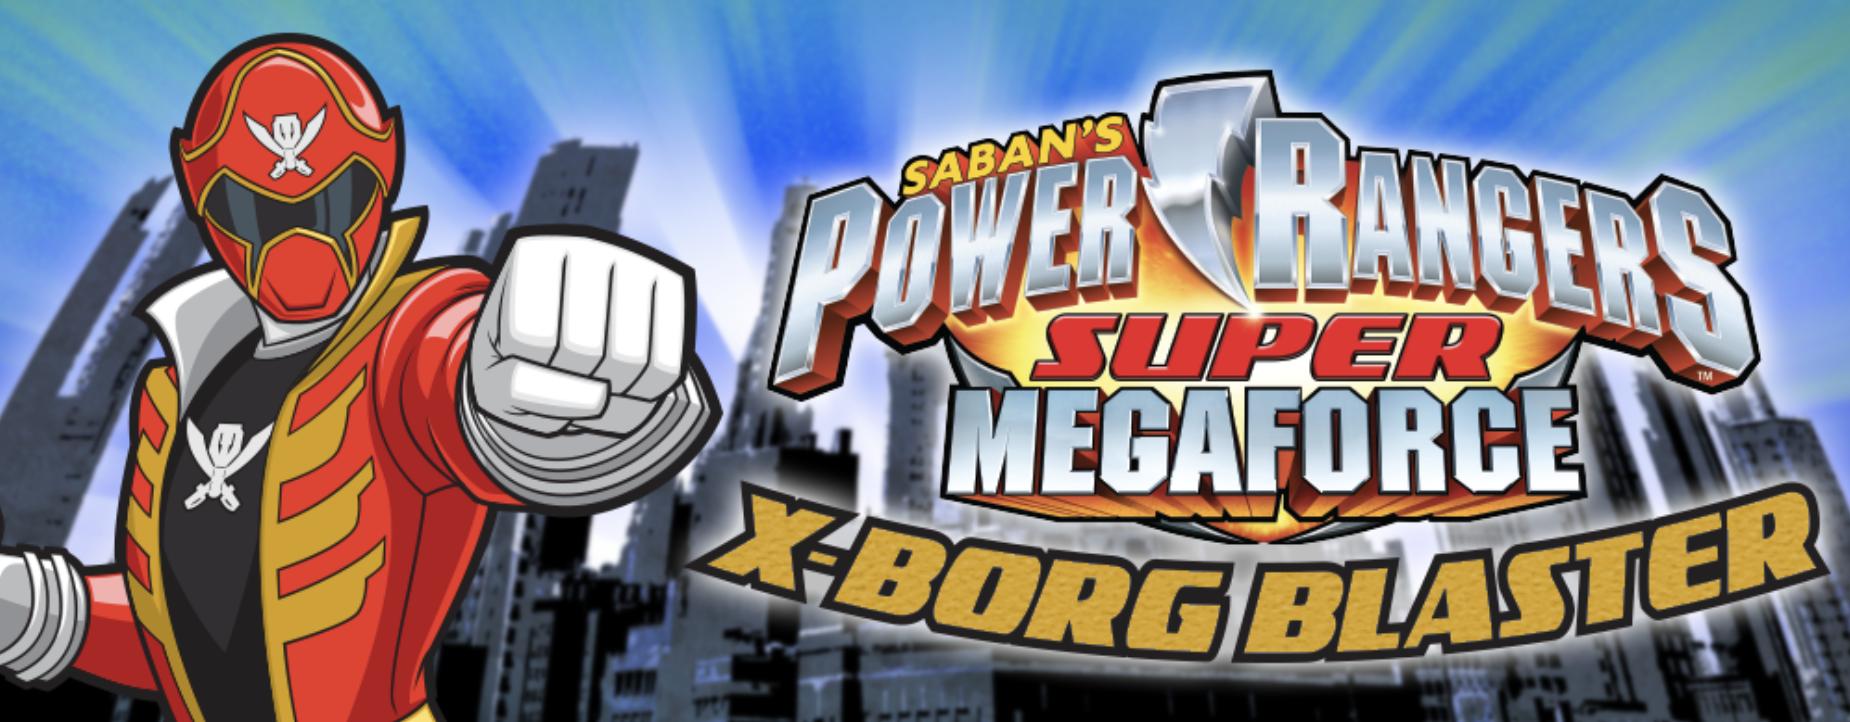 Play Power Rangers Blaster Game in 2020 Power